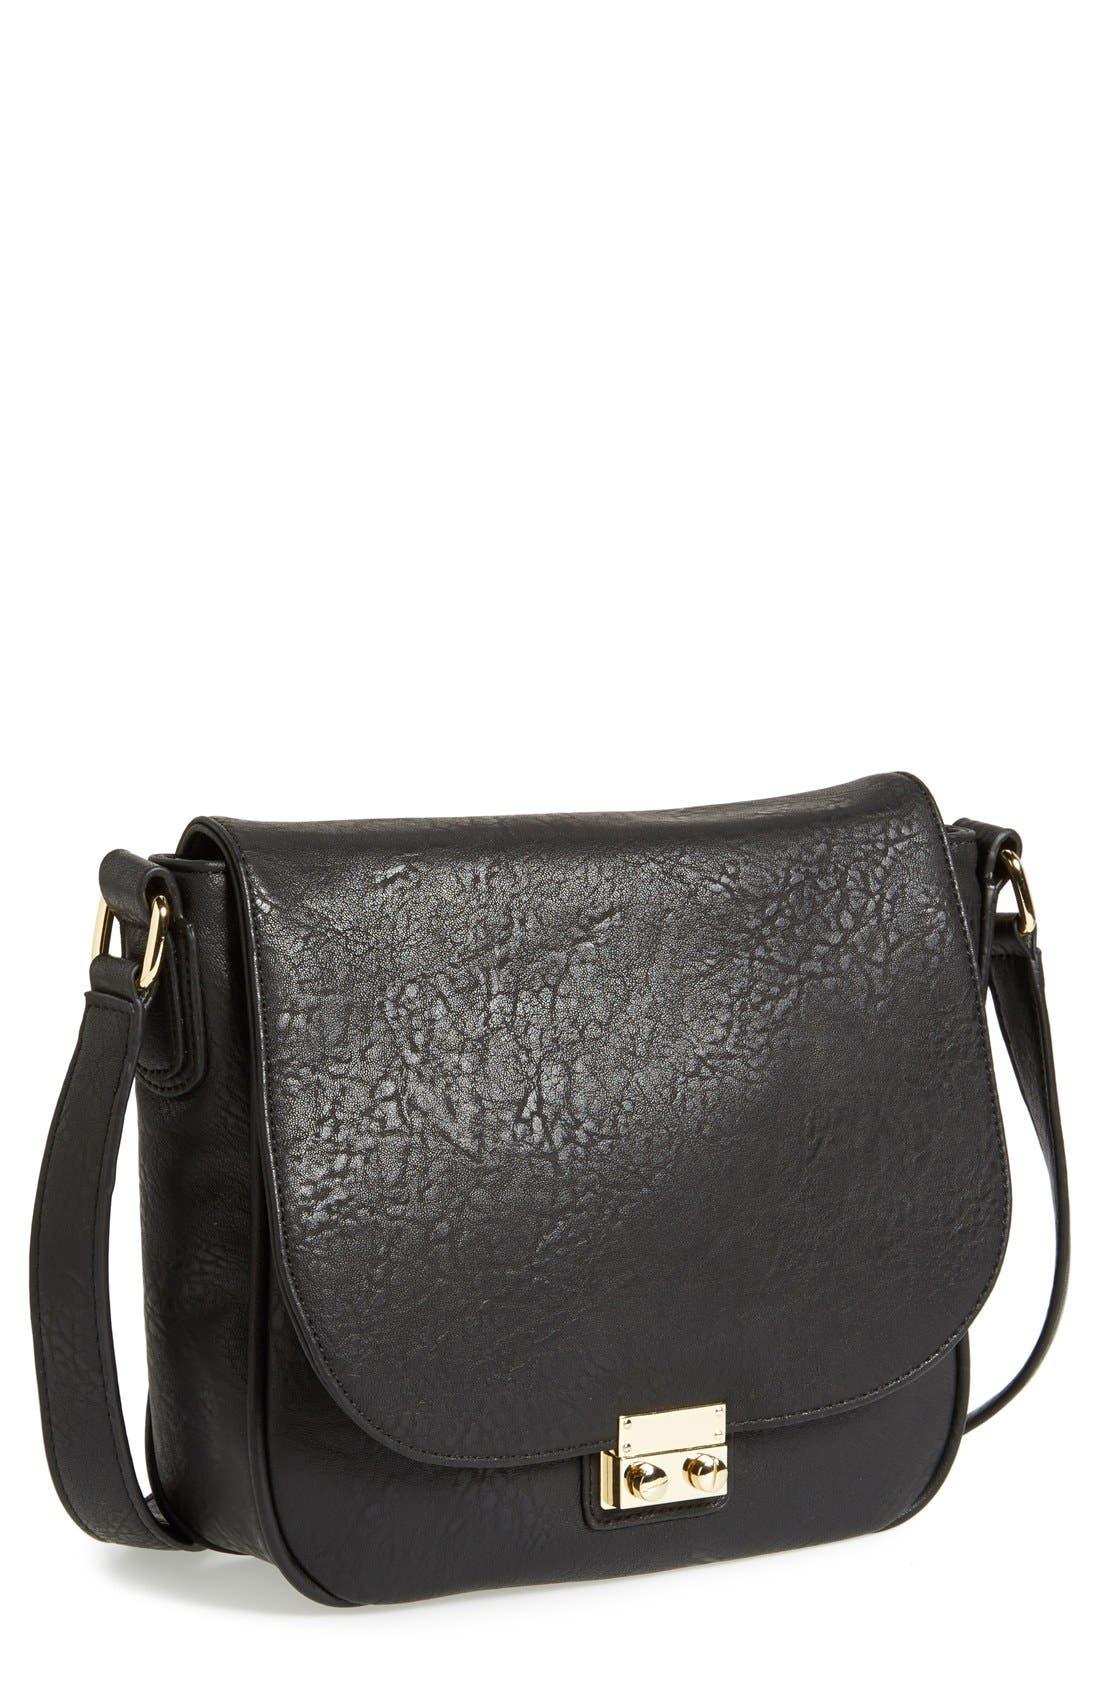 Main Image - Sole Society 'Sequoia' Faux Leather Saddle Bag